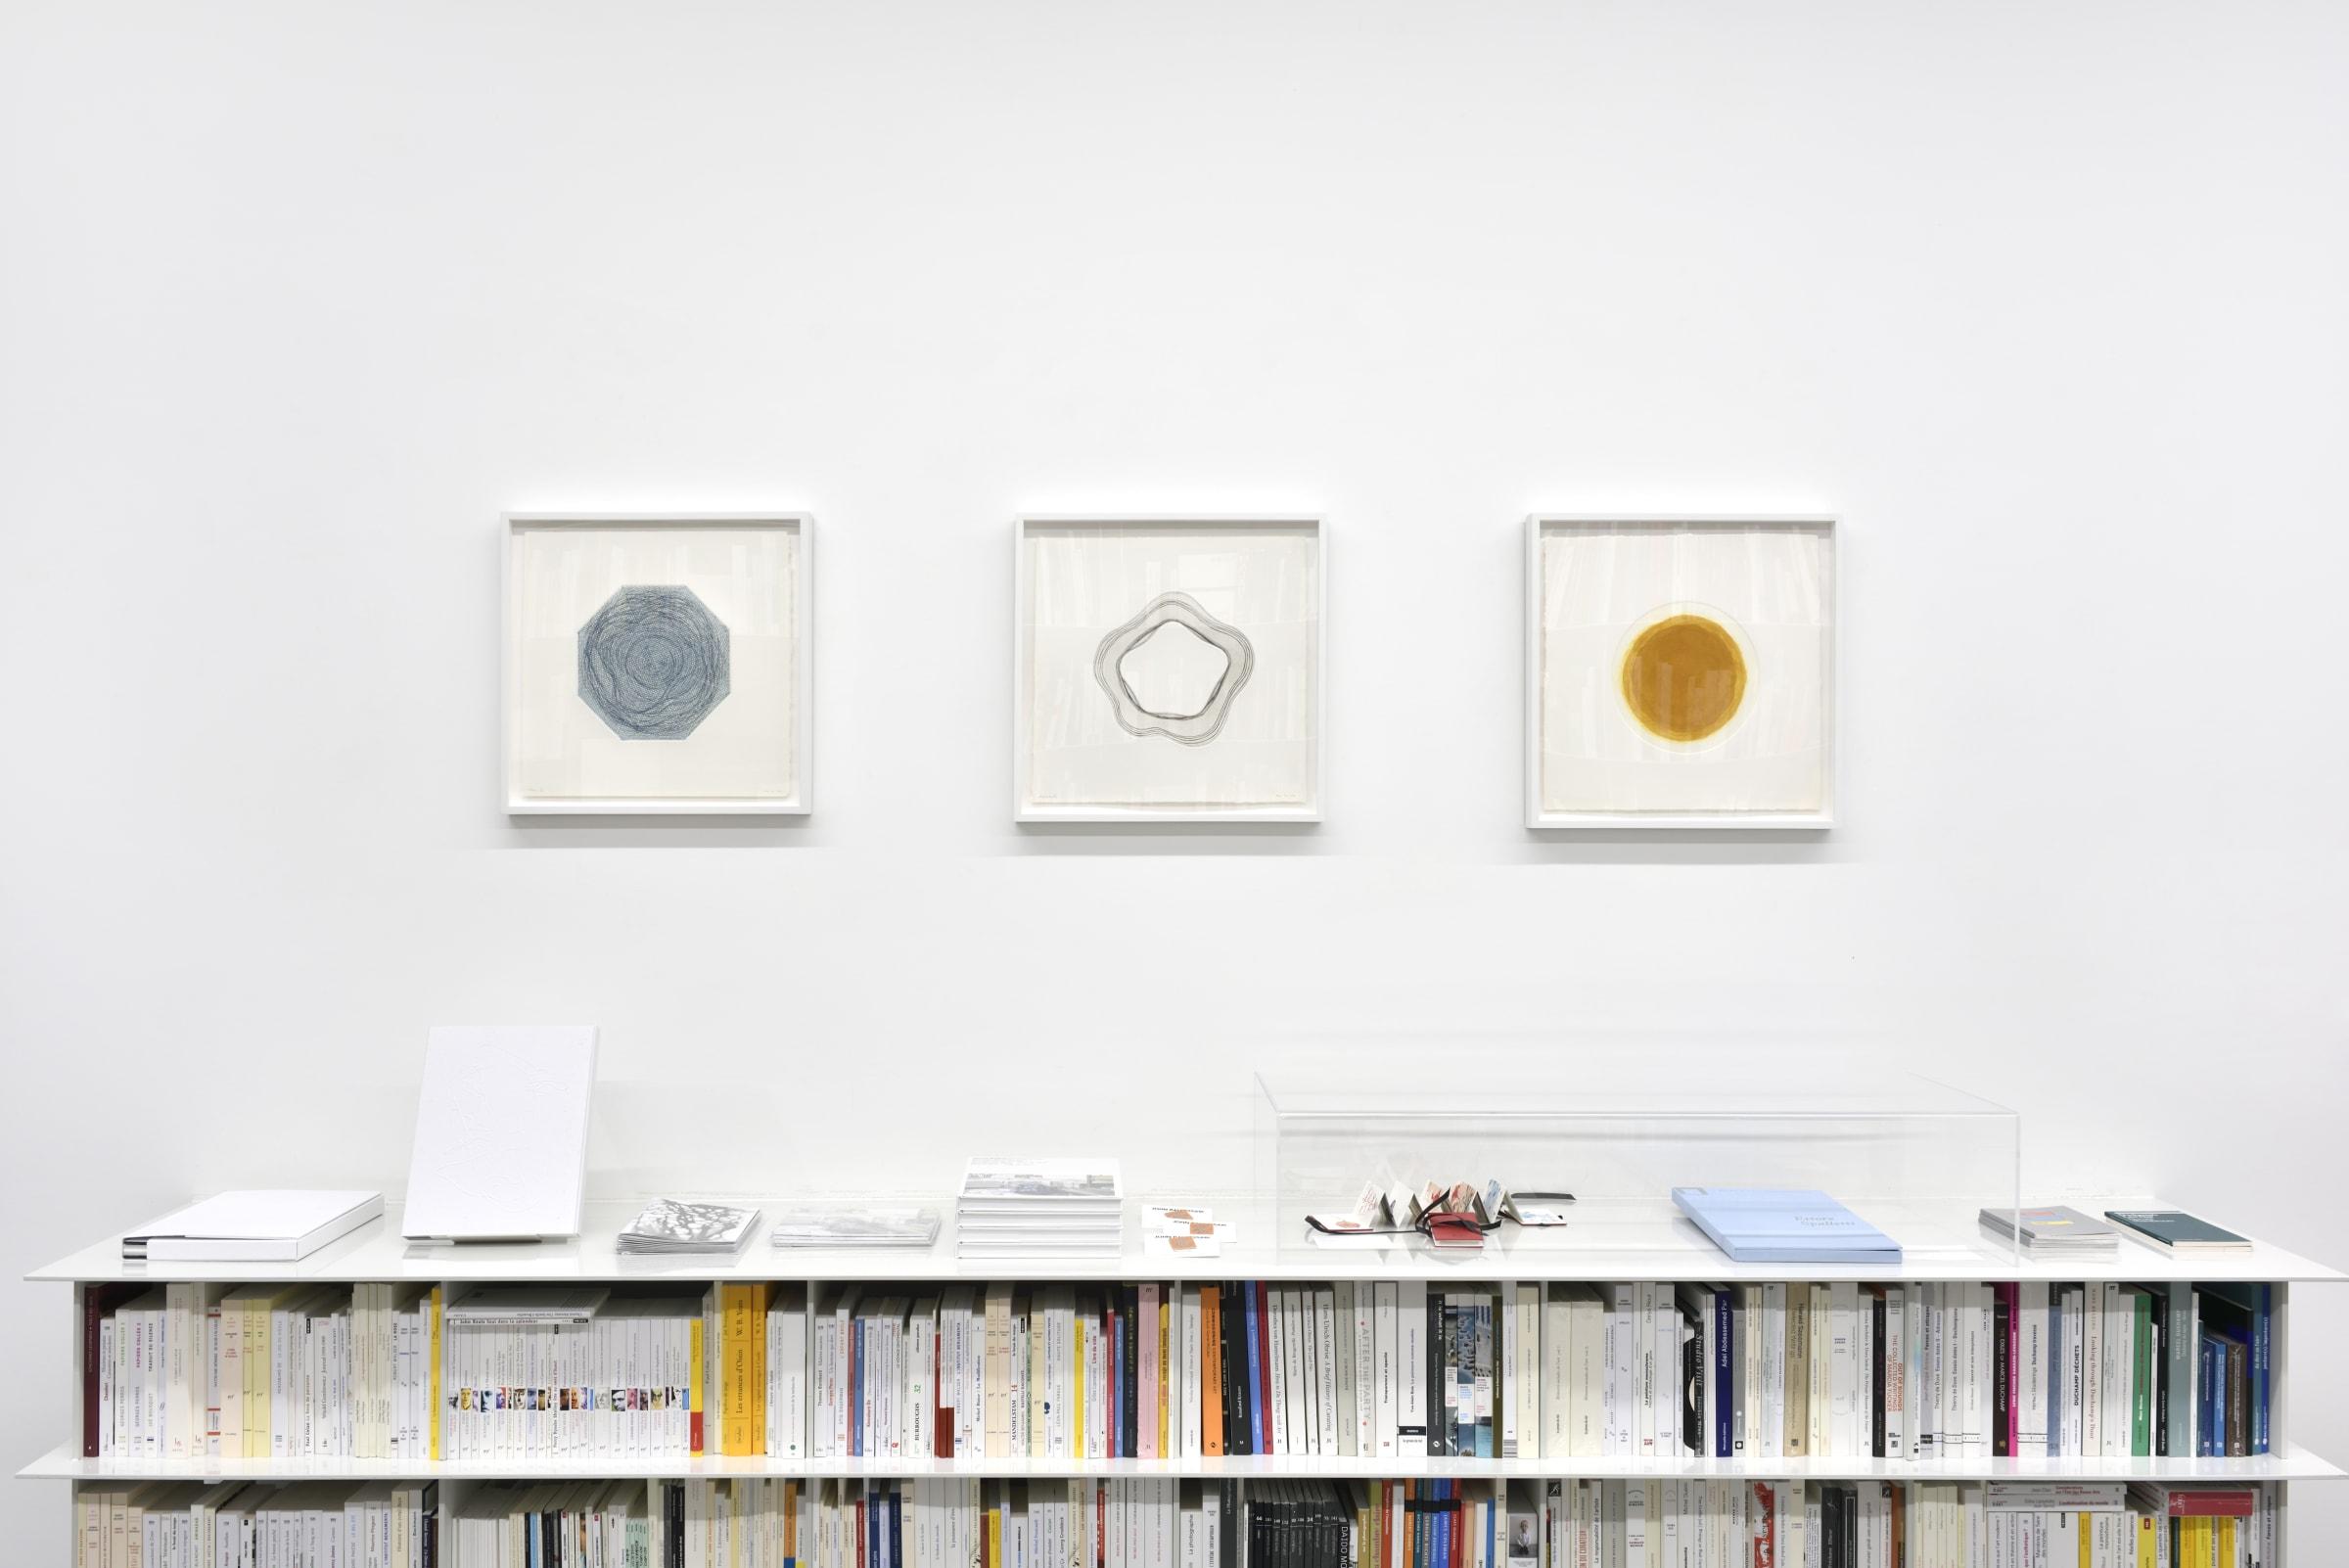 3 framed prints hanging on a white wall over bookshelves.